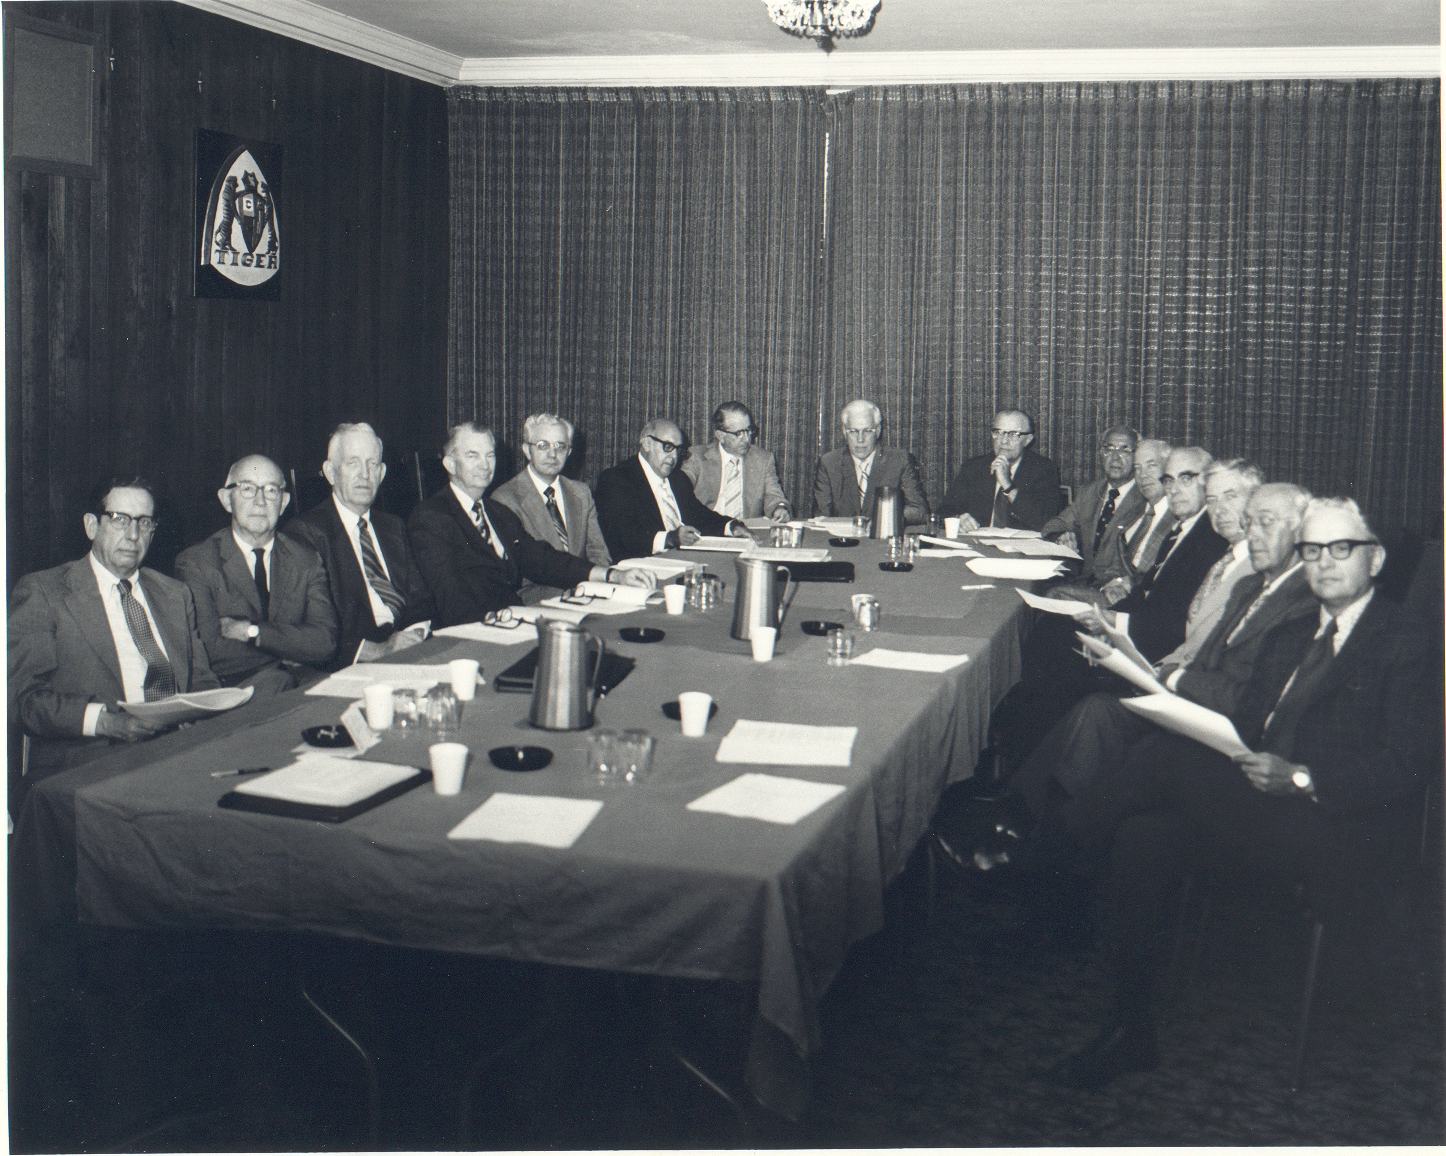 1973 Board of Directors